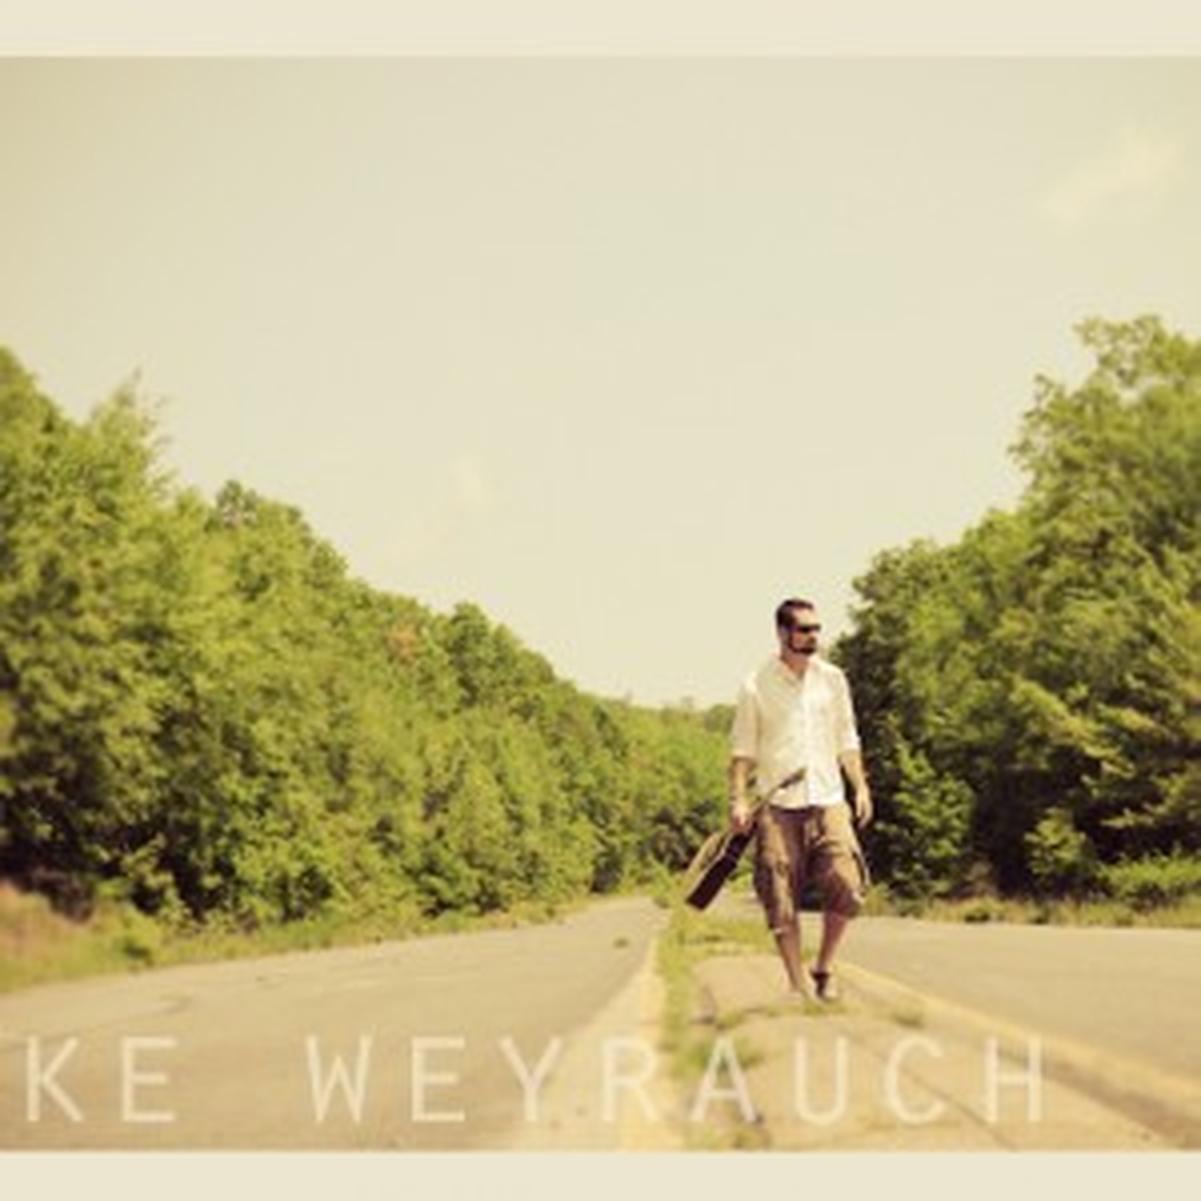 Mike Weyrauch